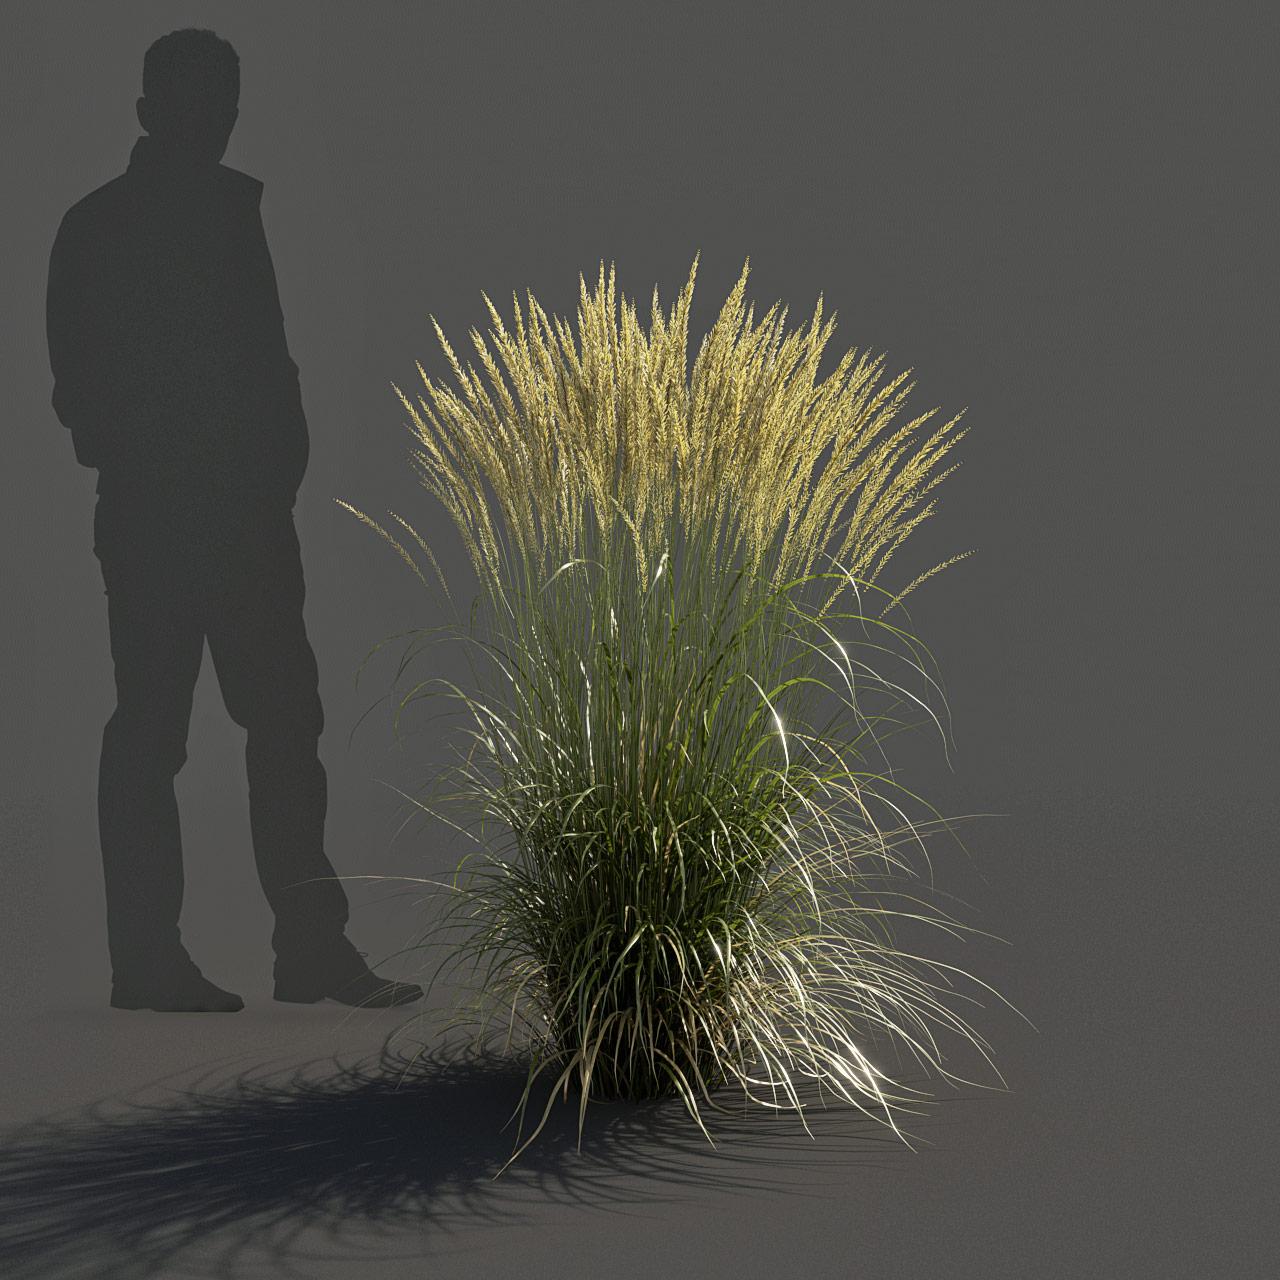 Feather Reed Grass 3D model medium_v03 -  'Karl Foerster' - Calamagrostis acutiflora